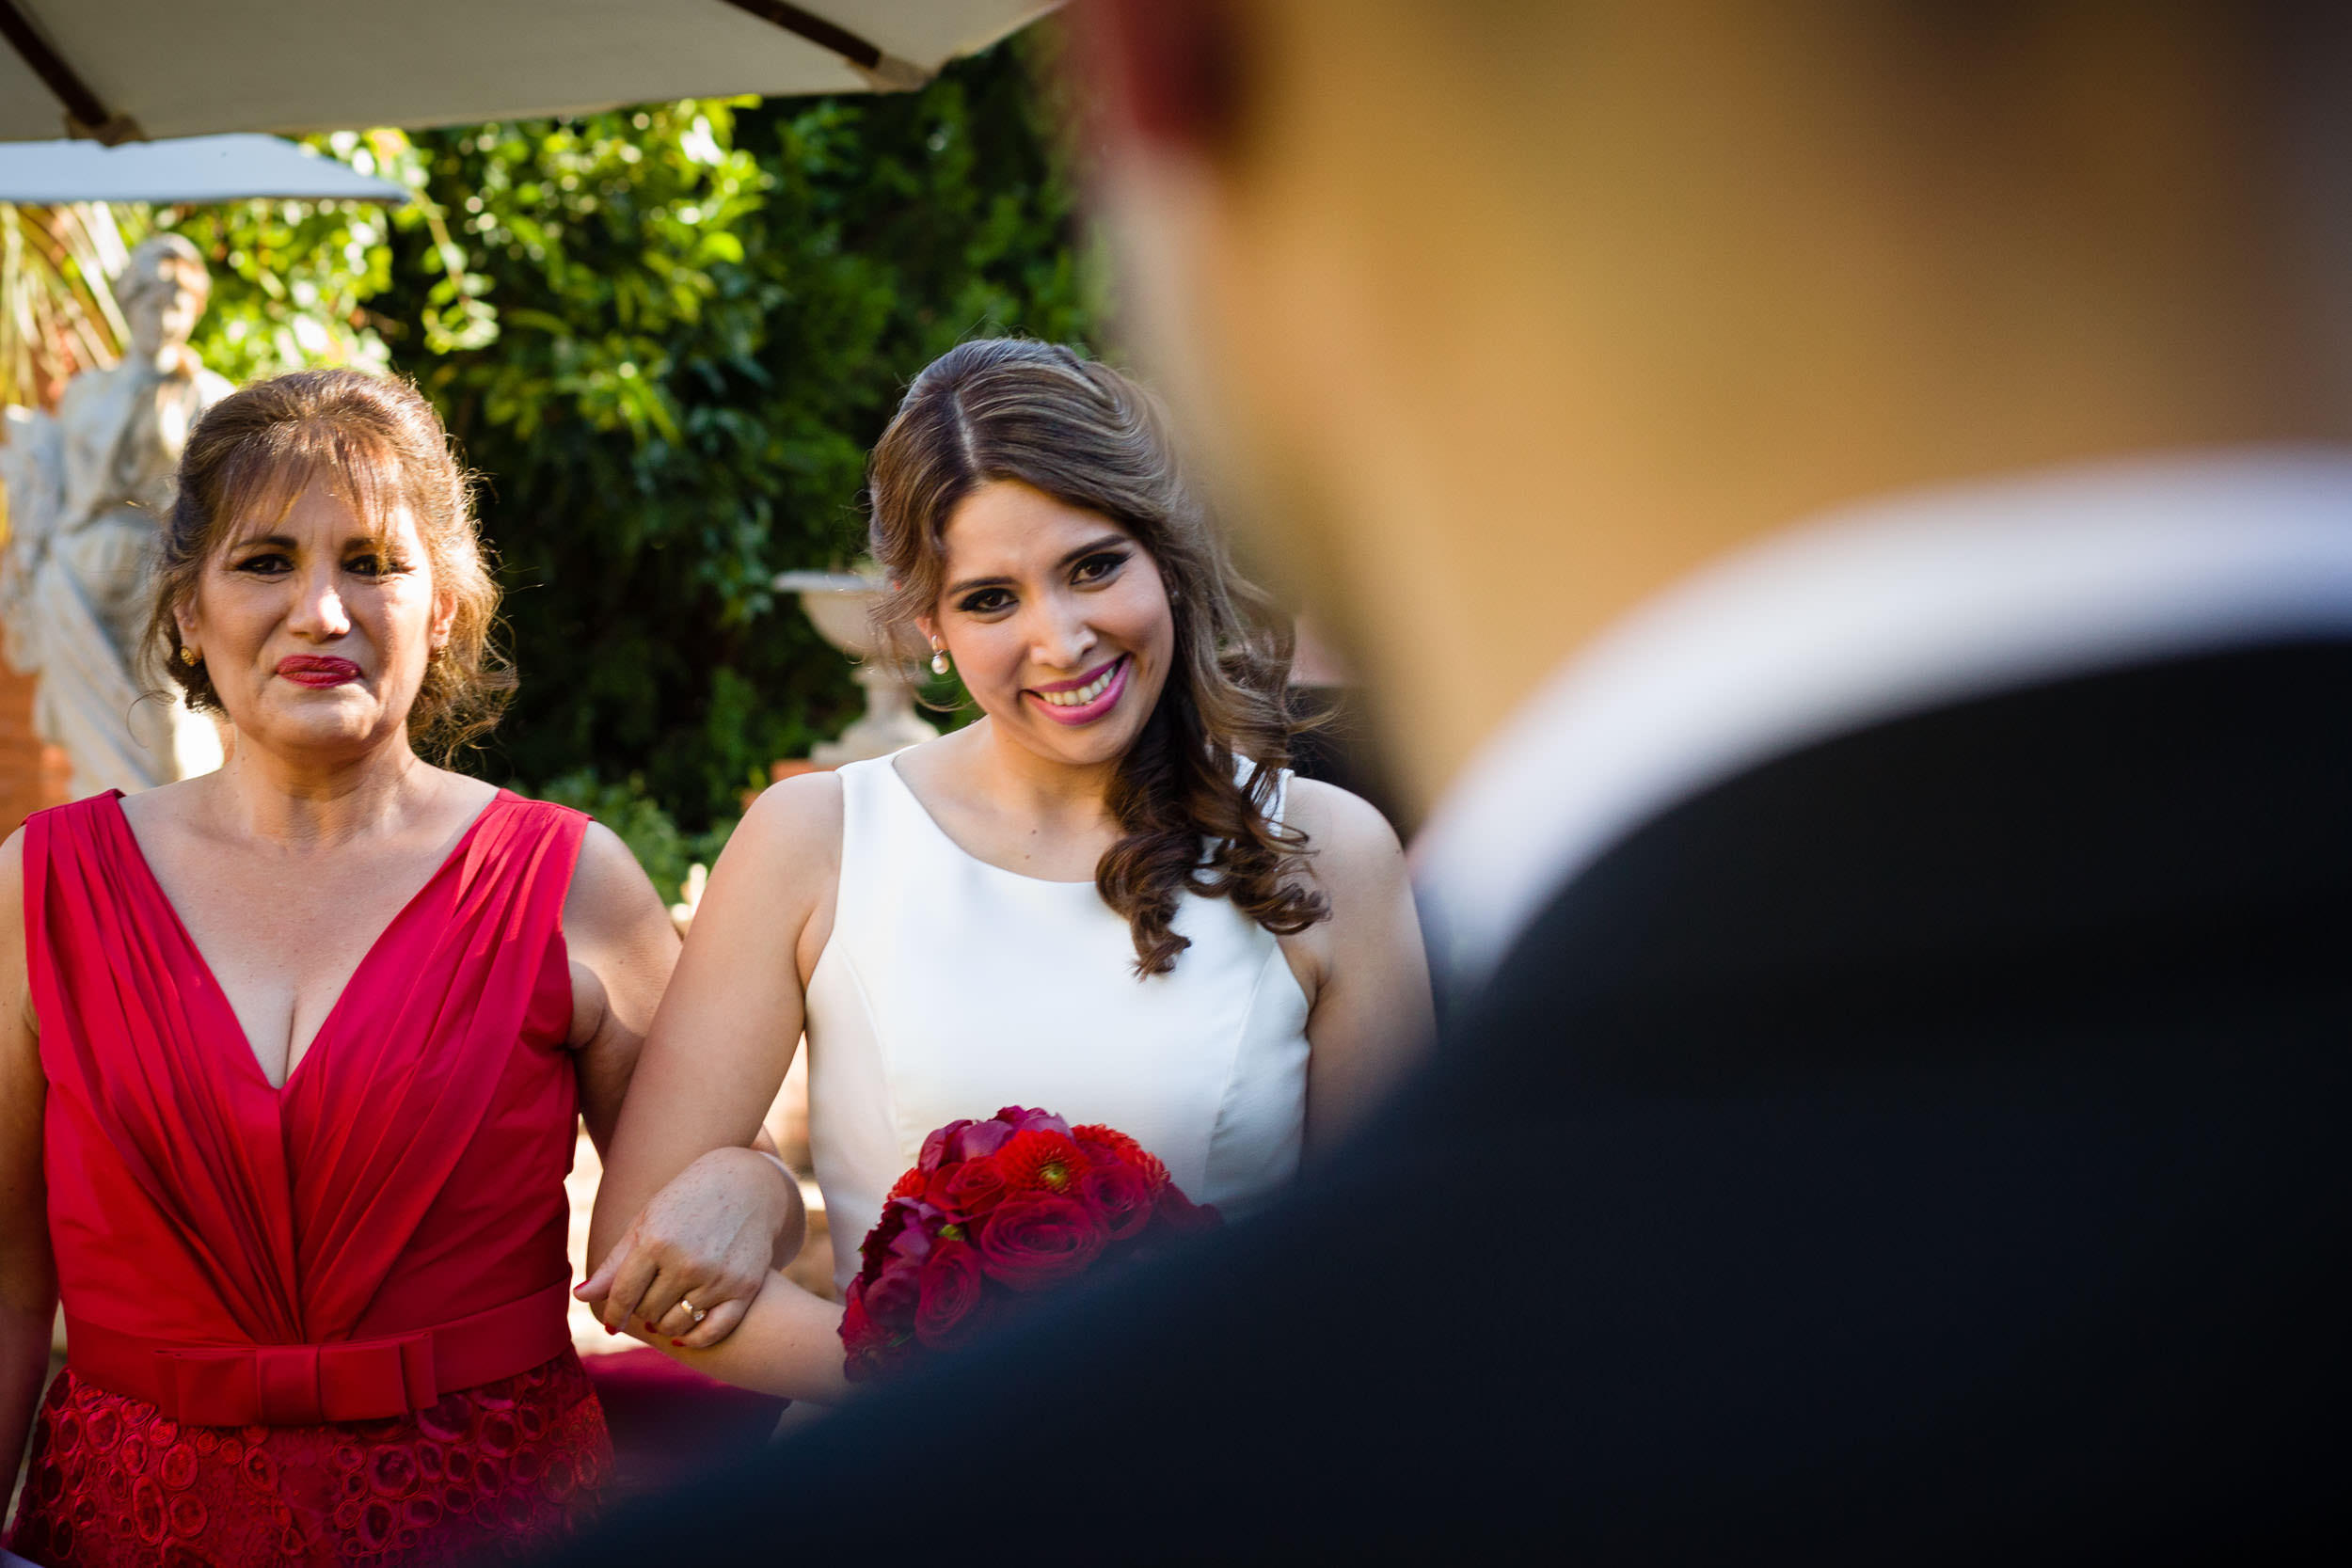 Toledo Wedding Photography at Hotel Valdepalacios - James Sturcke | sturcke.org